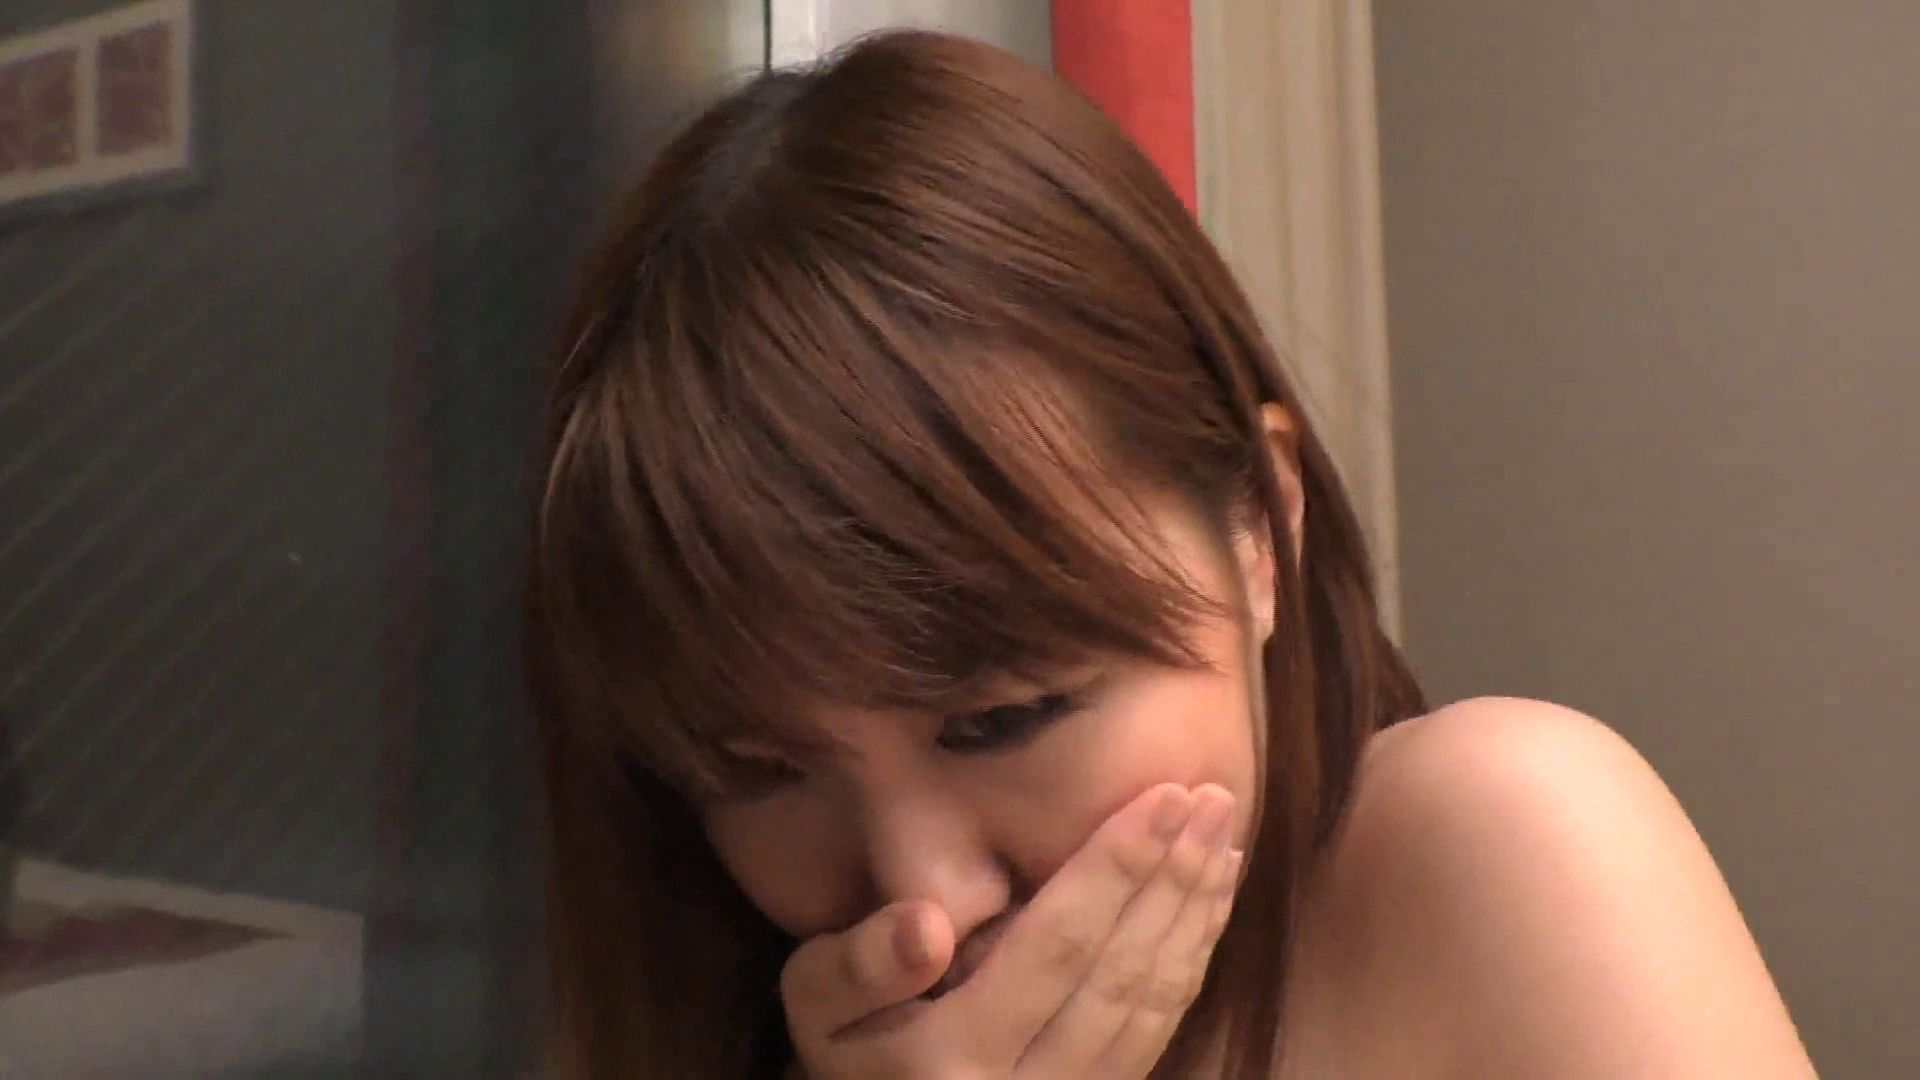 S級厳選美女ビッチガールVol.08 OLセックス  75画像 15